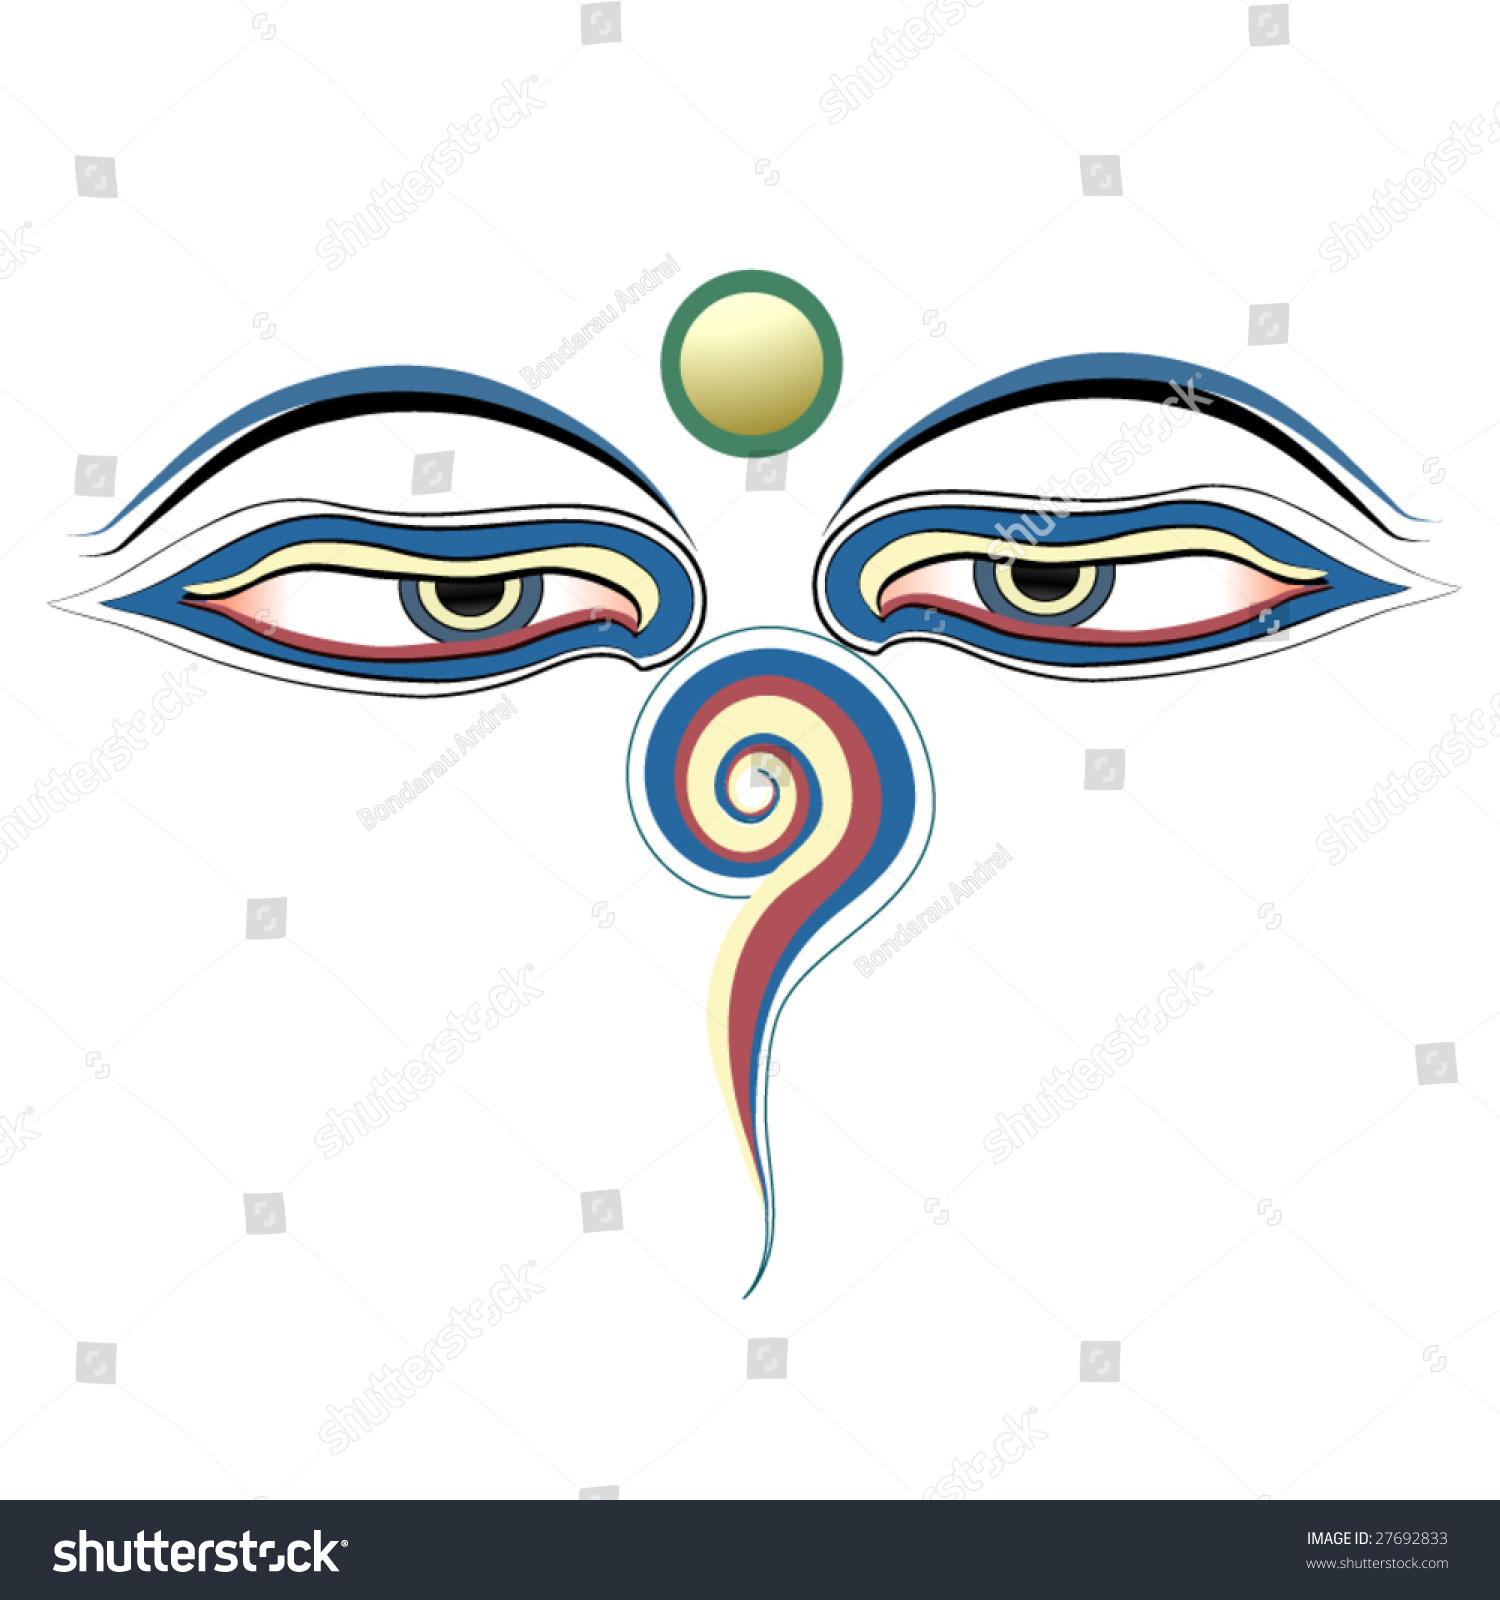 Buddha eyes vector stock vector 27692833 shutterstock buddha eyes vector biocorpaavc Images